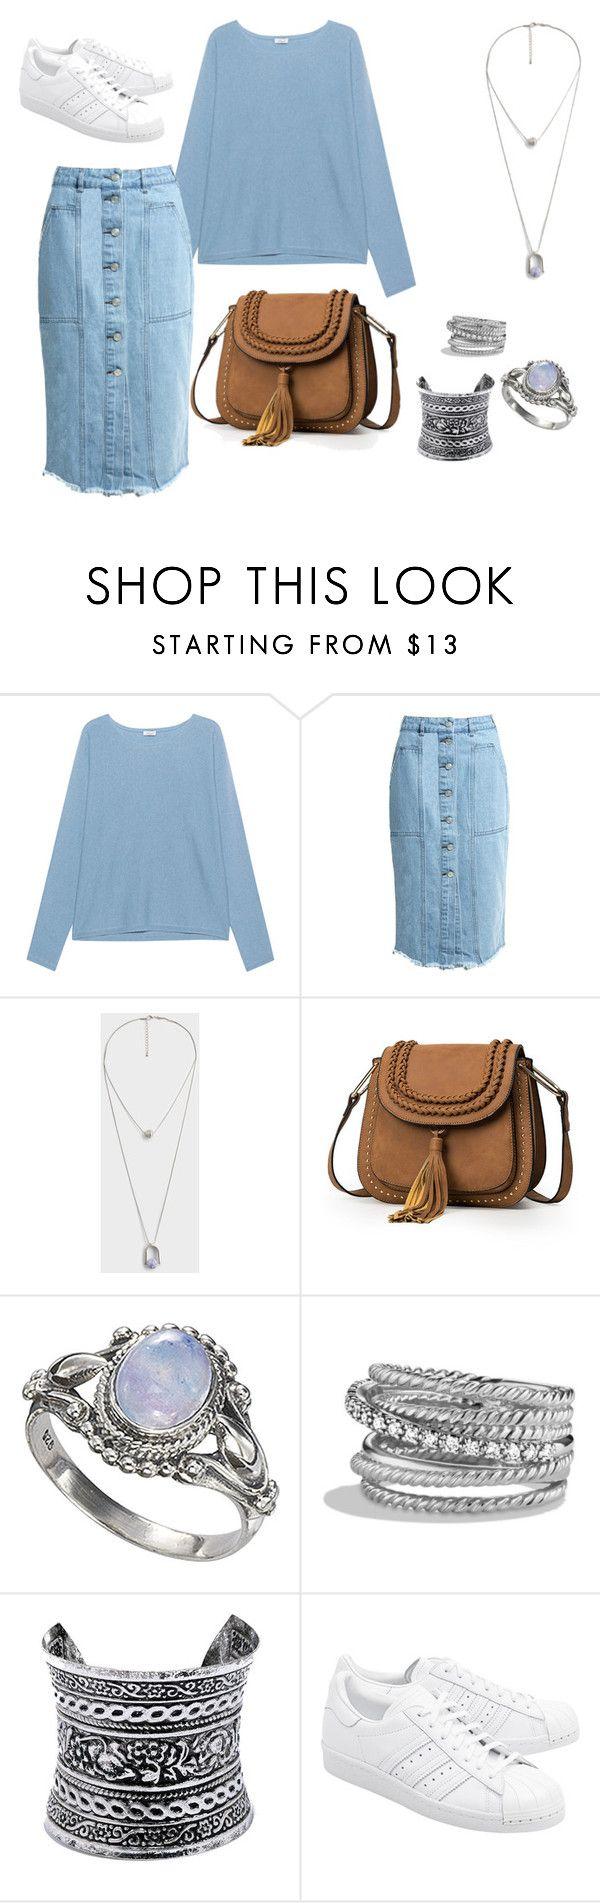 fashion fall by missmikey on Polyvore featuring iHeart, Sans Souci, adidas Originals, David Yurman, MANGO and LULUS